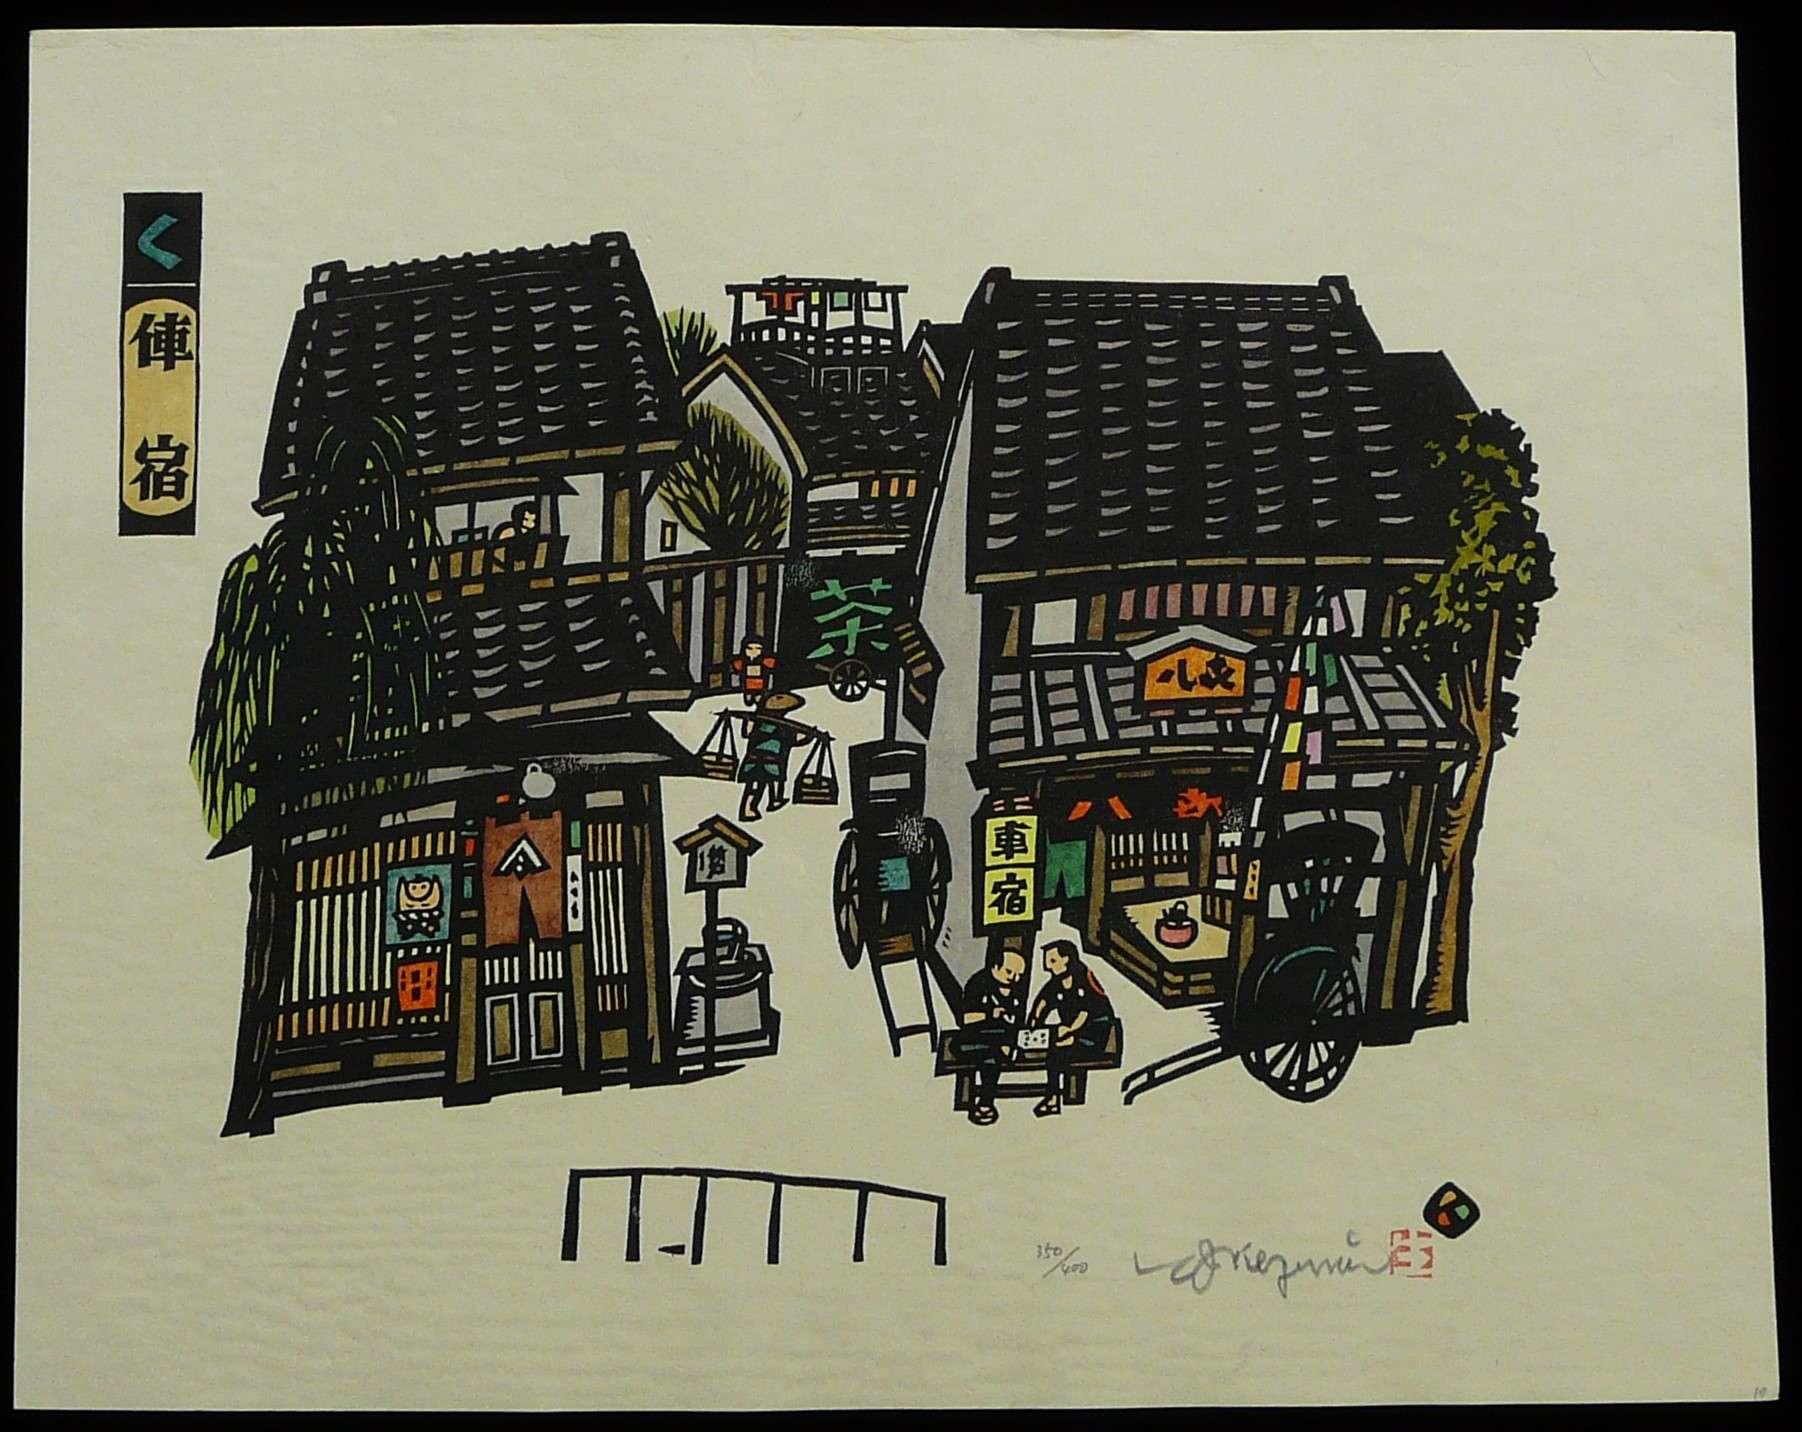 KIYOSHI IKEZUMI: #P2974 IN THE VILLAGE